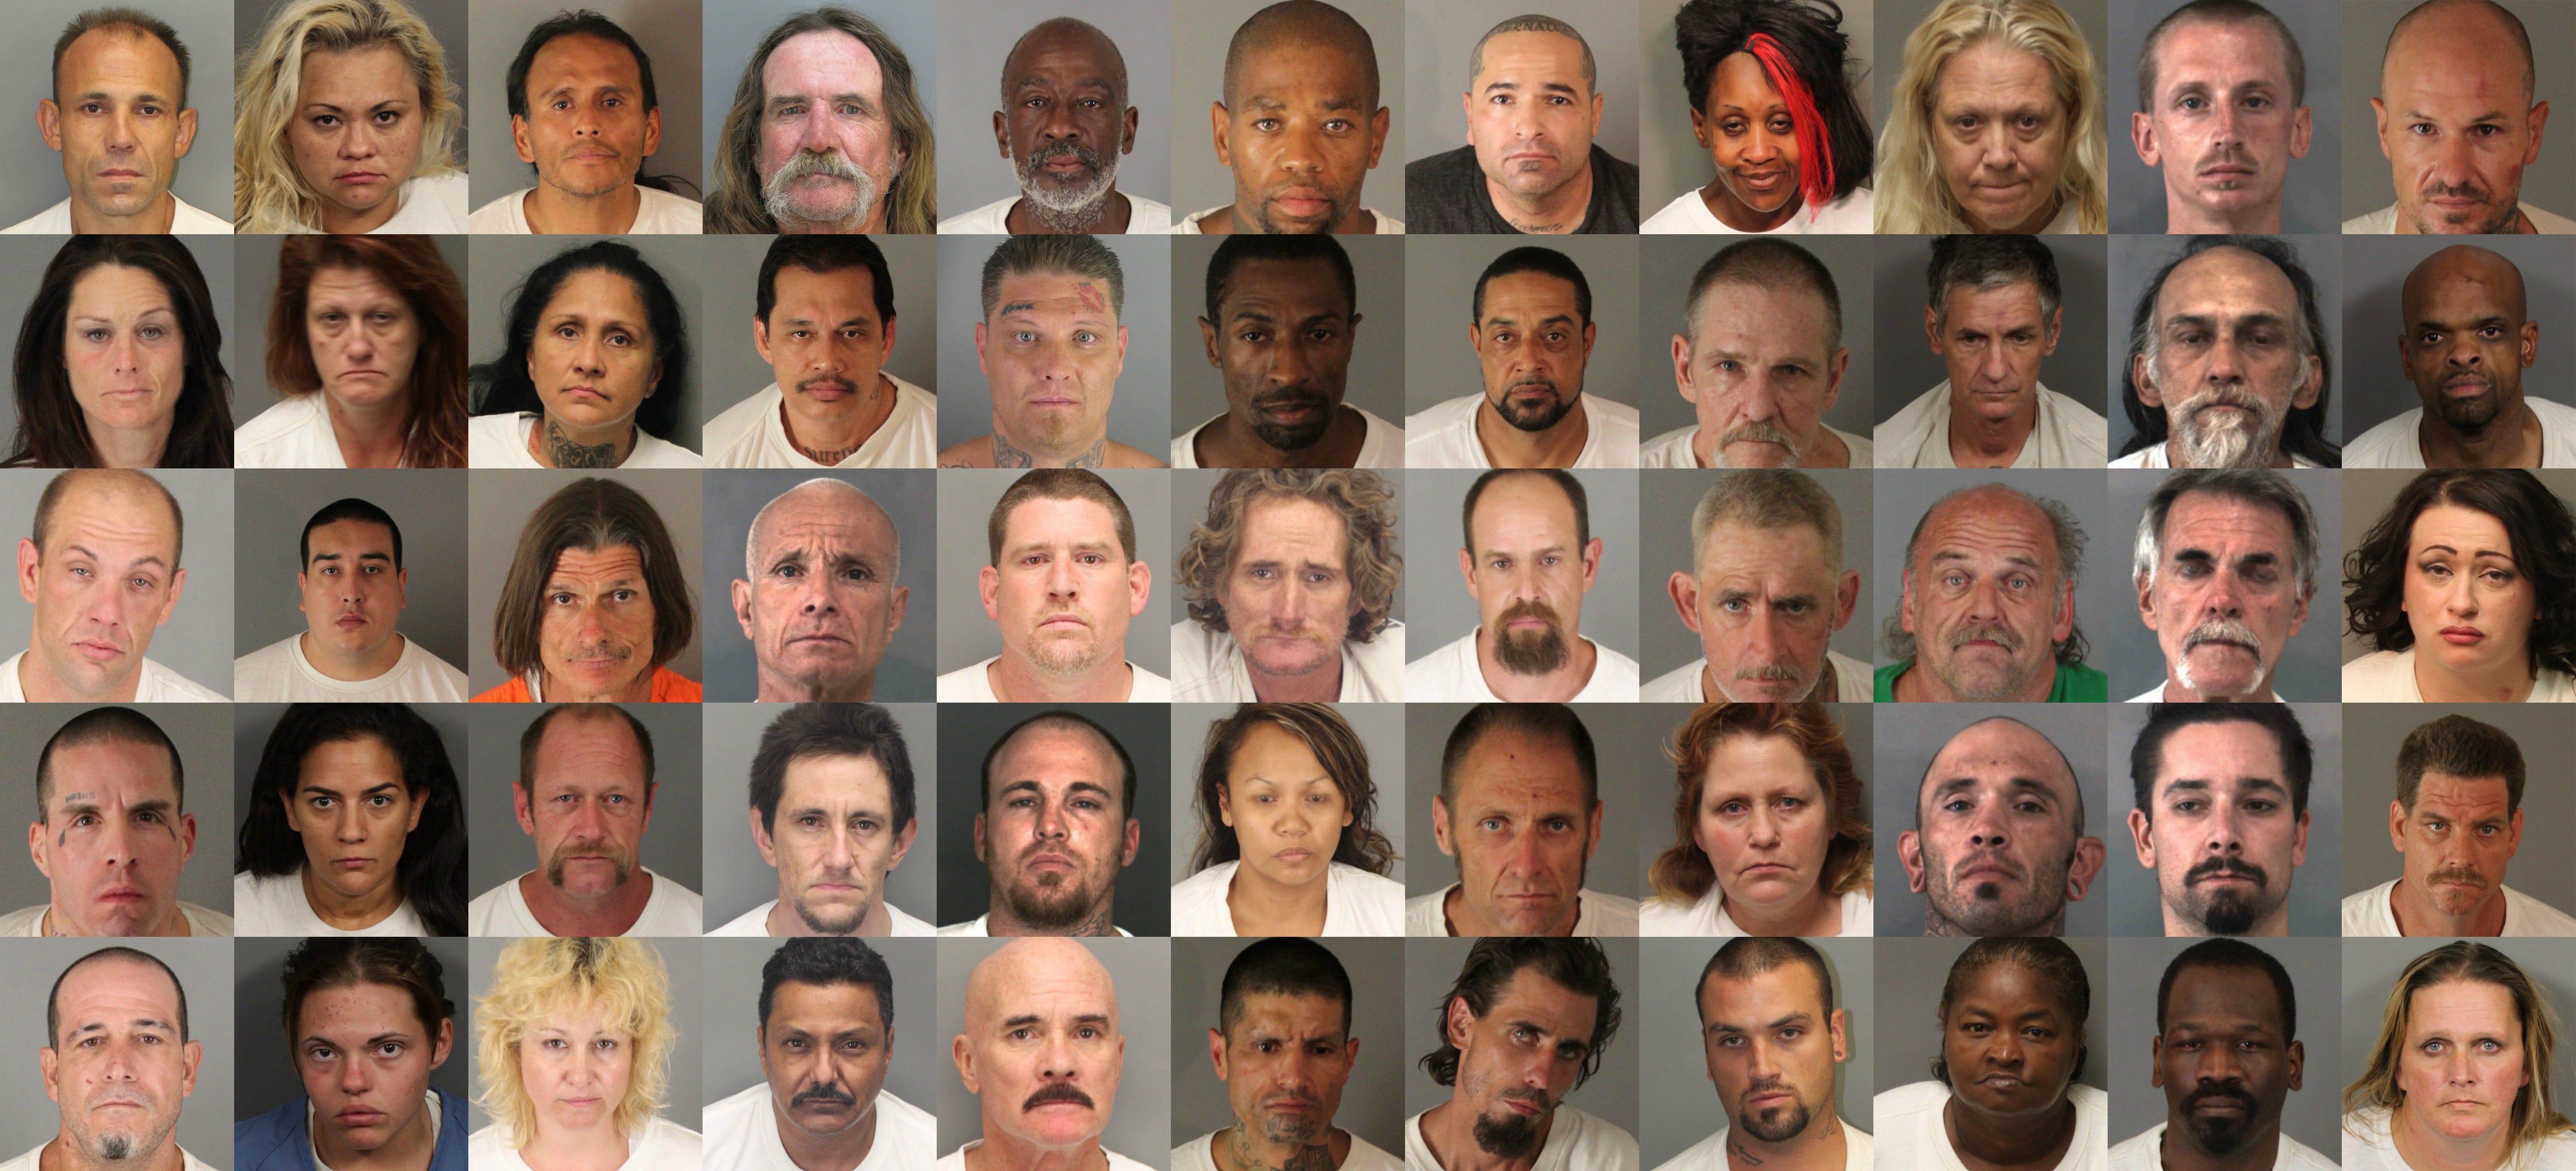 Disadvantages of dating a felon